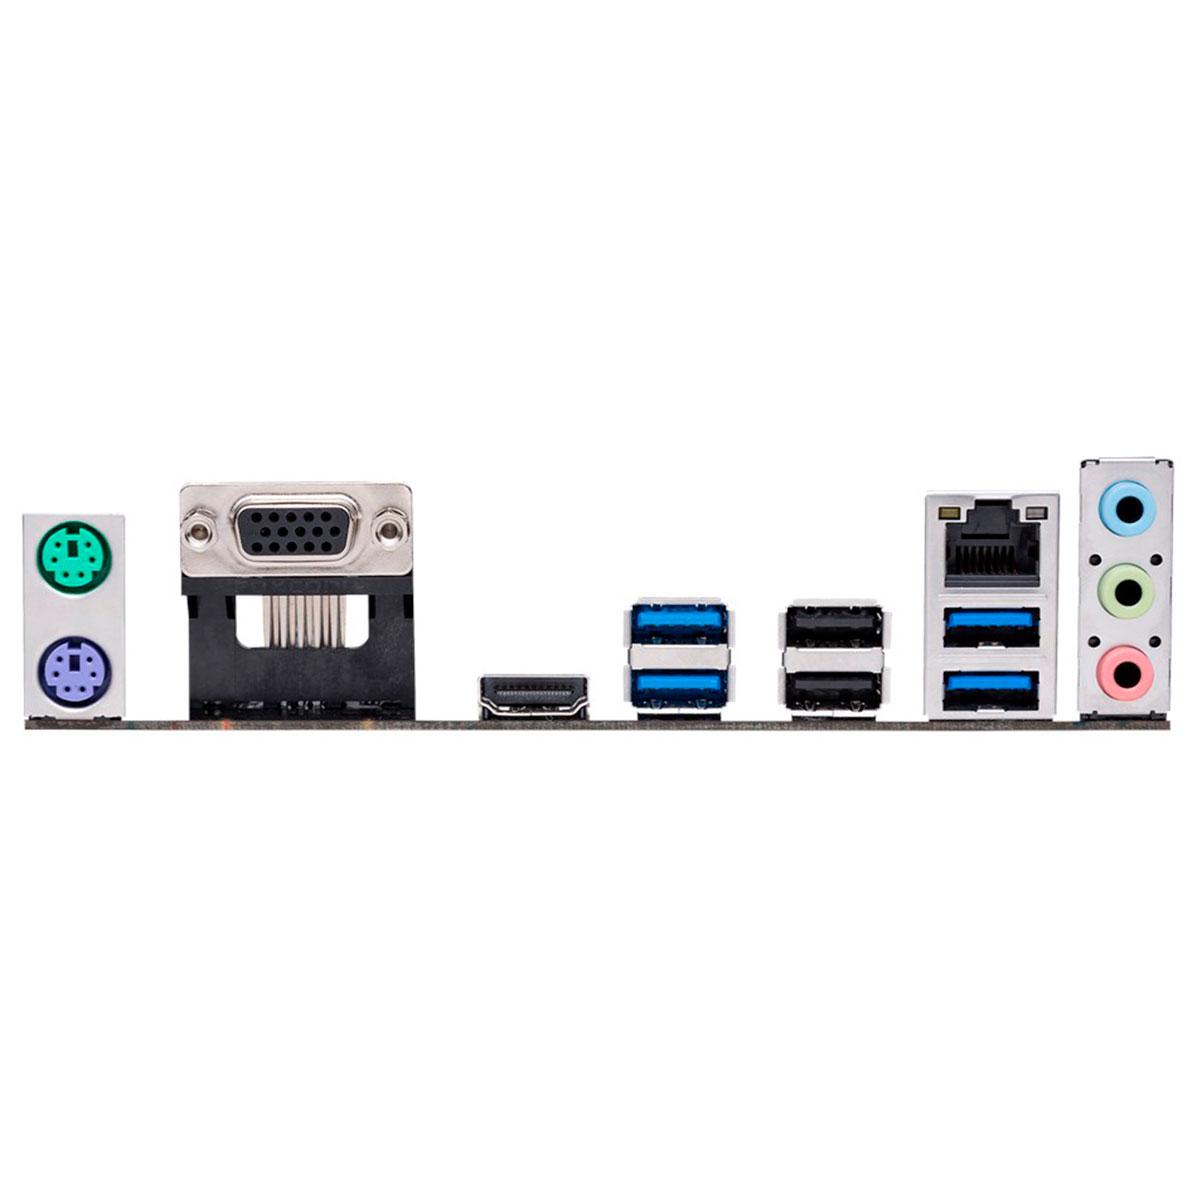 Placa Mãe Asus Prime A320M-K/BR, AMD Socket AM4, DDR4, mATX